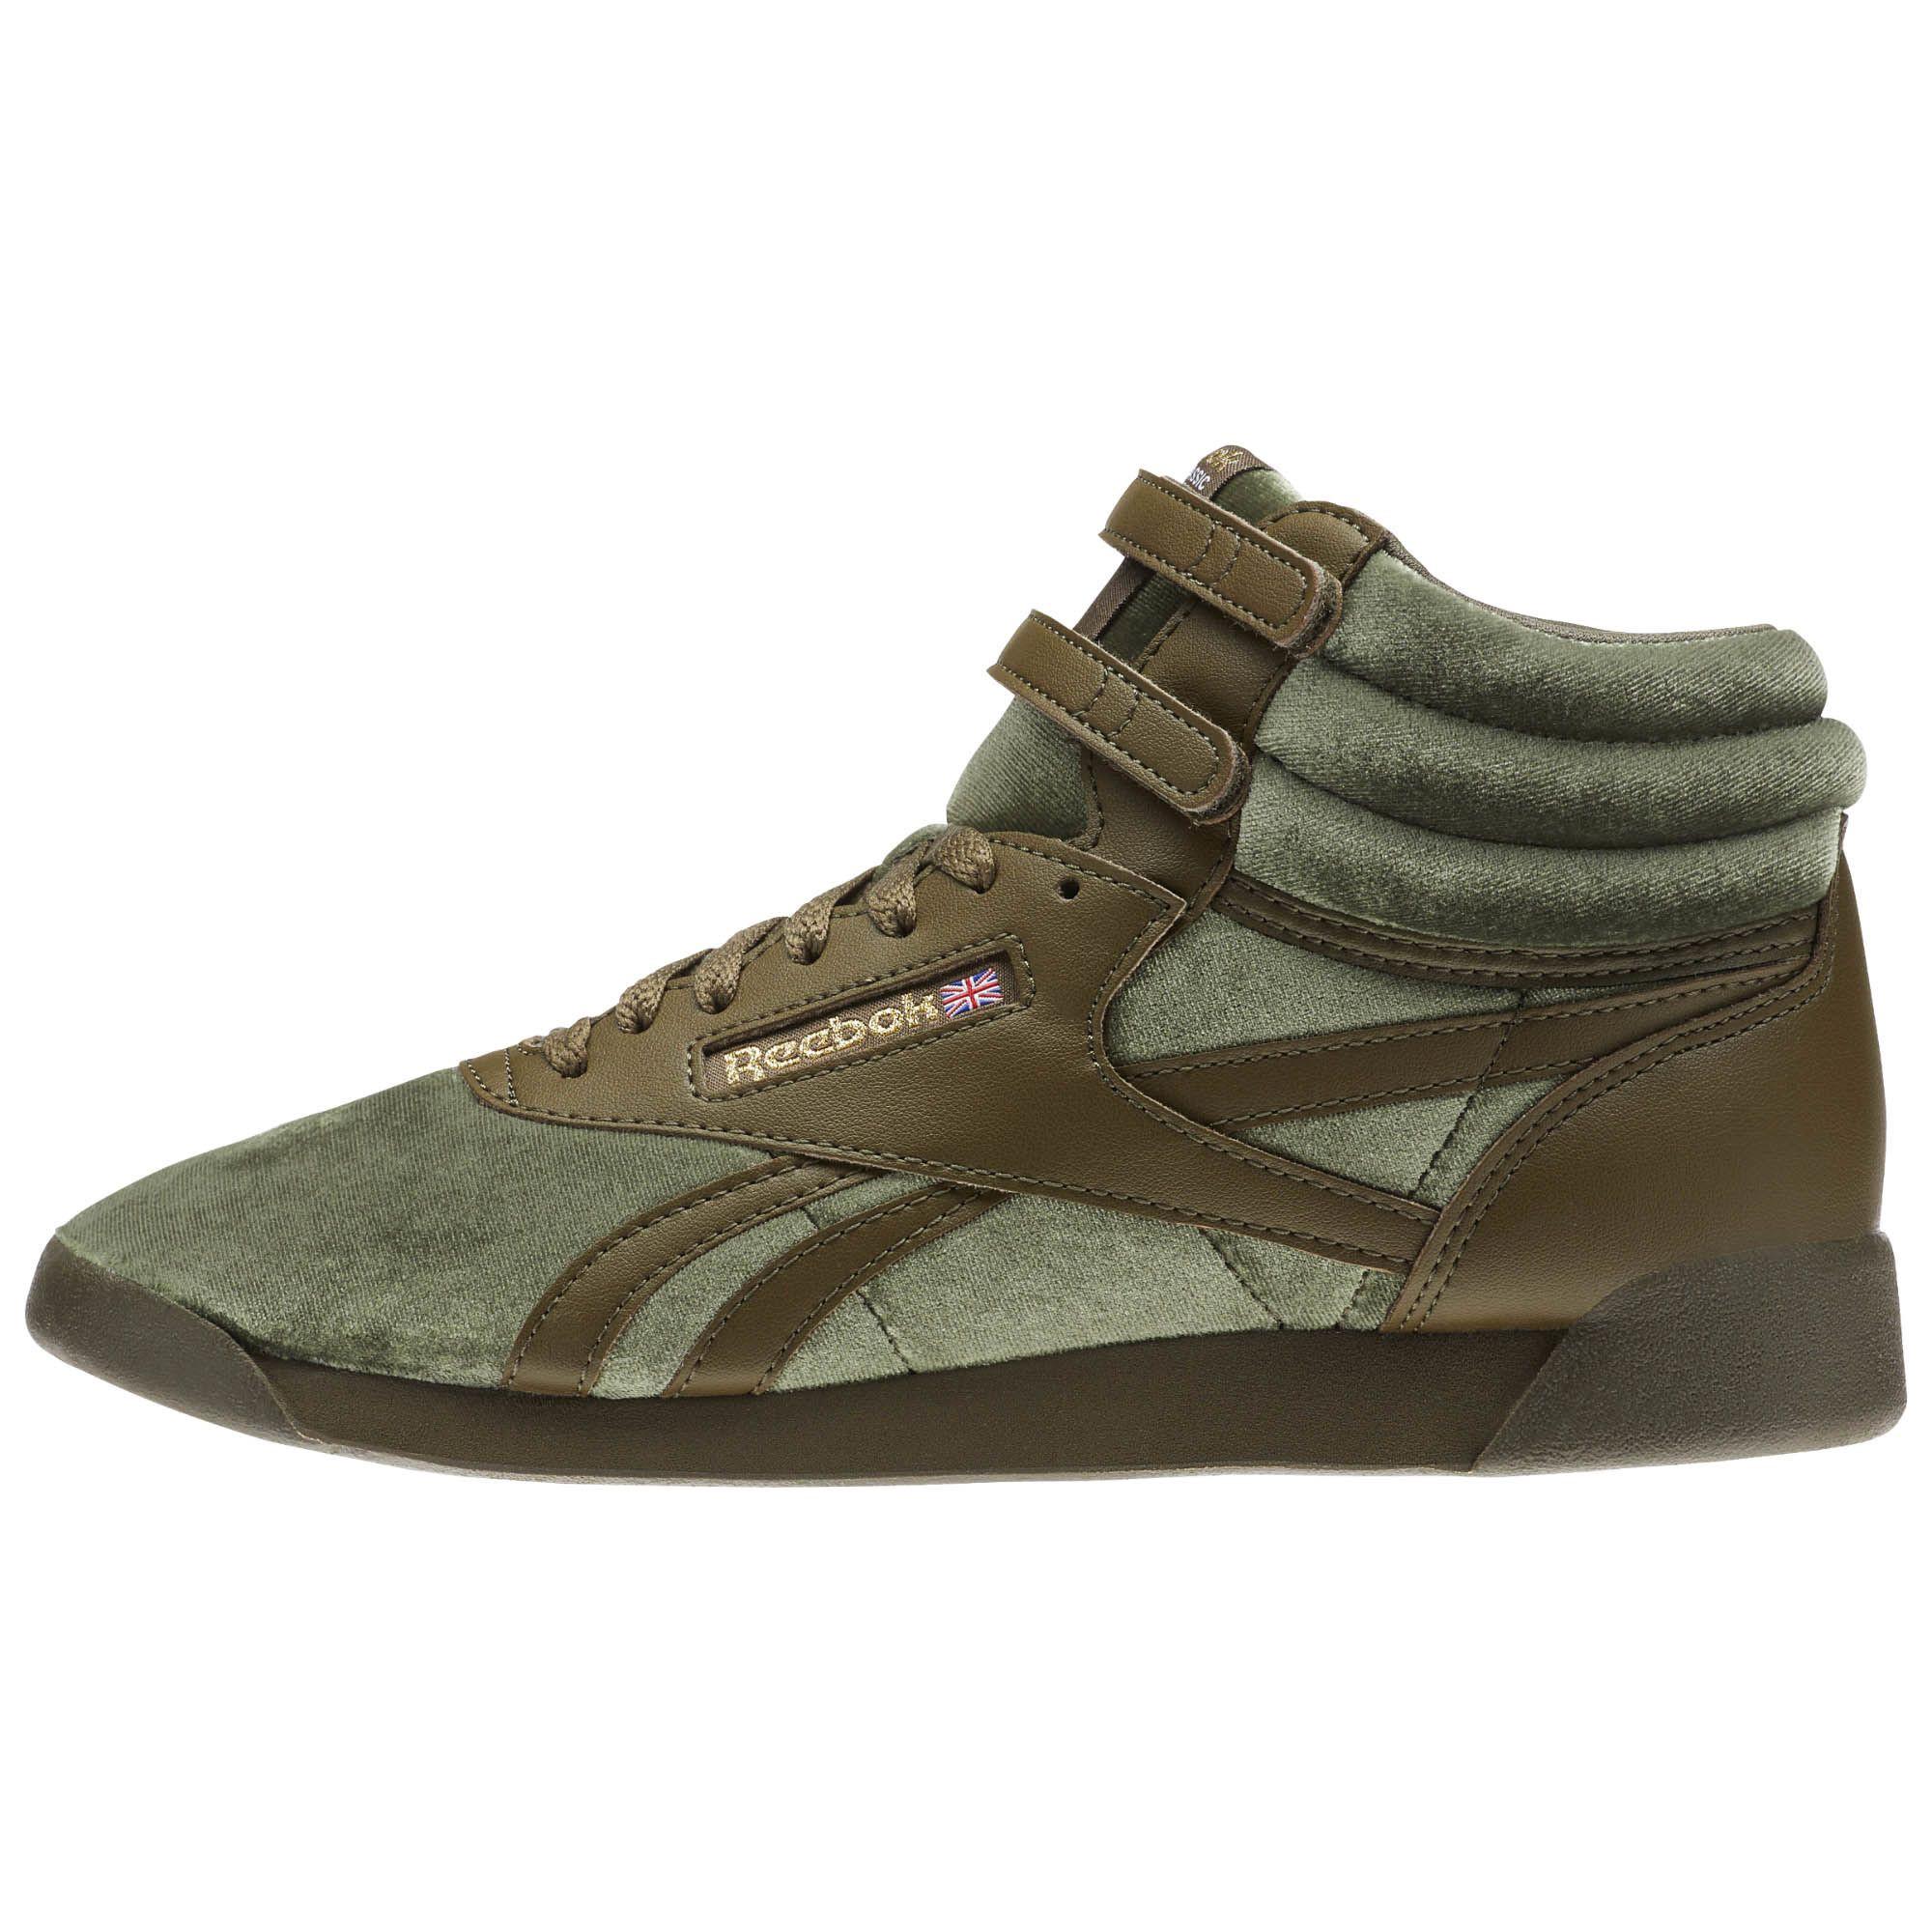 40067992055e Reebok Freestyle Hi Velvet Sneaker - Grade School Army Green   Gold ...